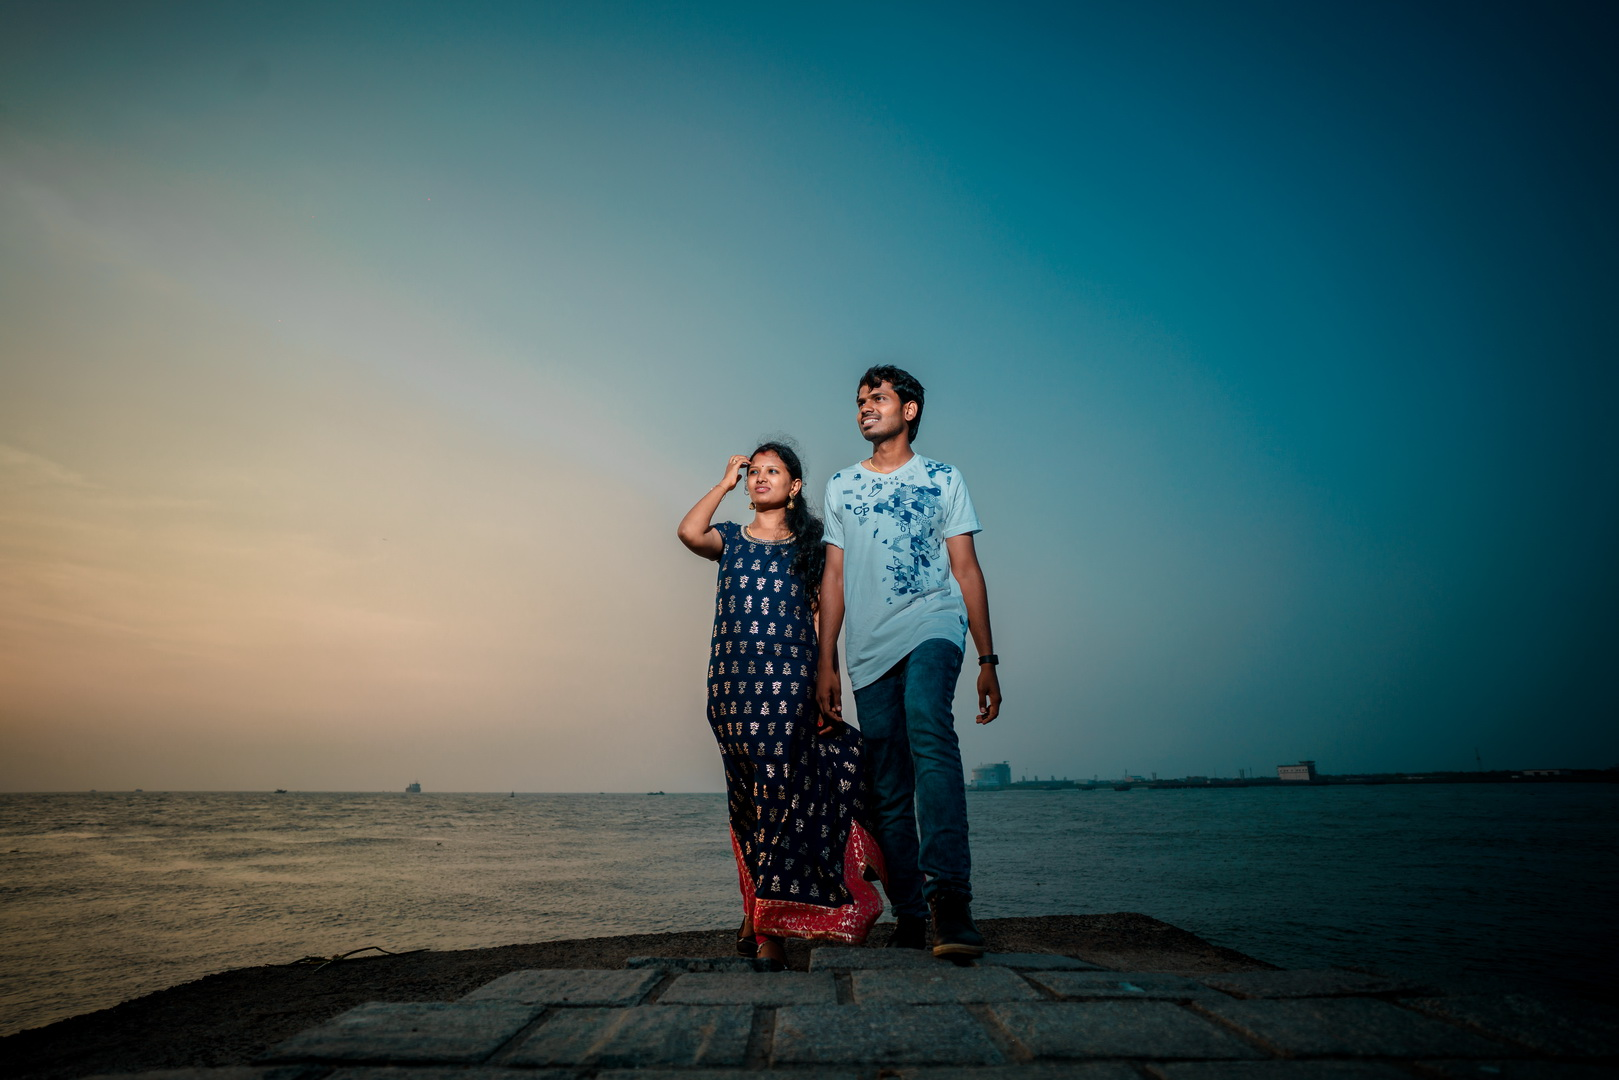 wedding photography in erode janaki videos (15)